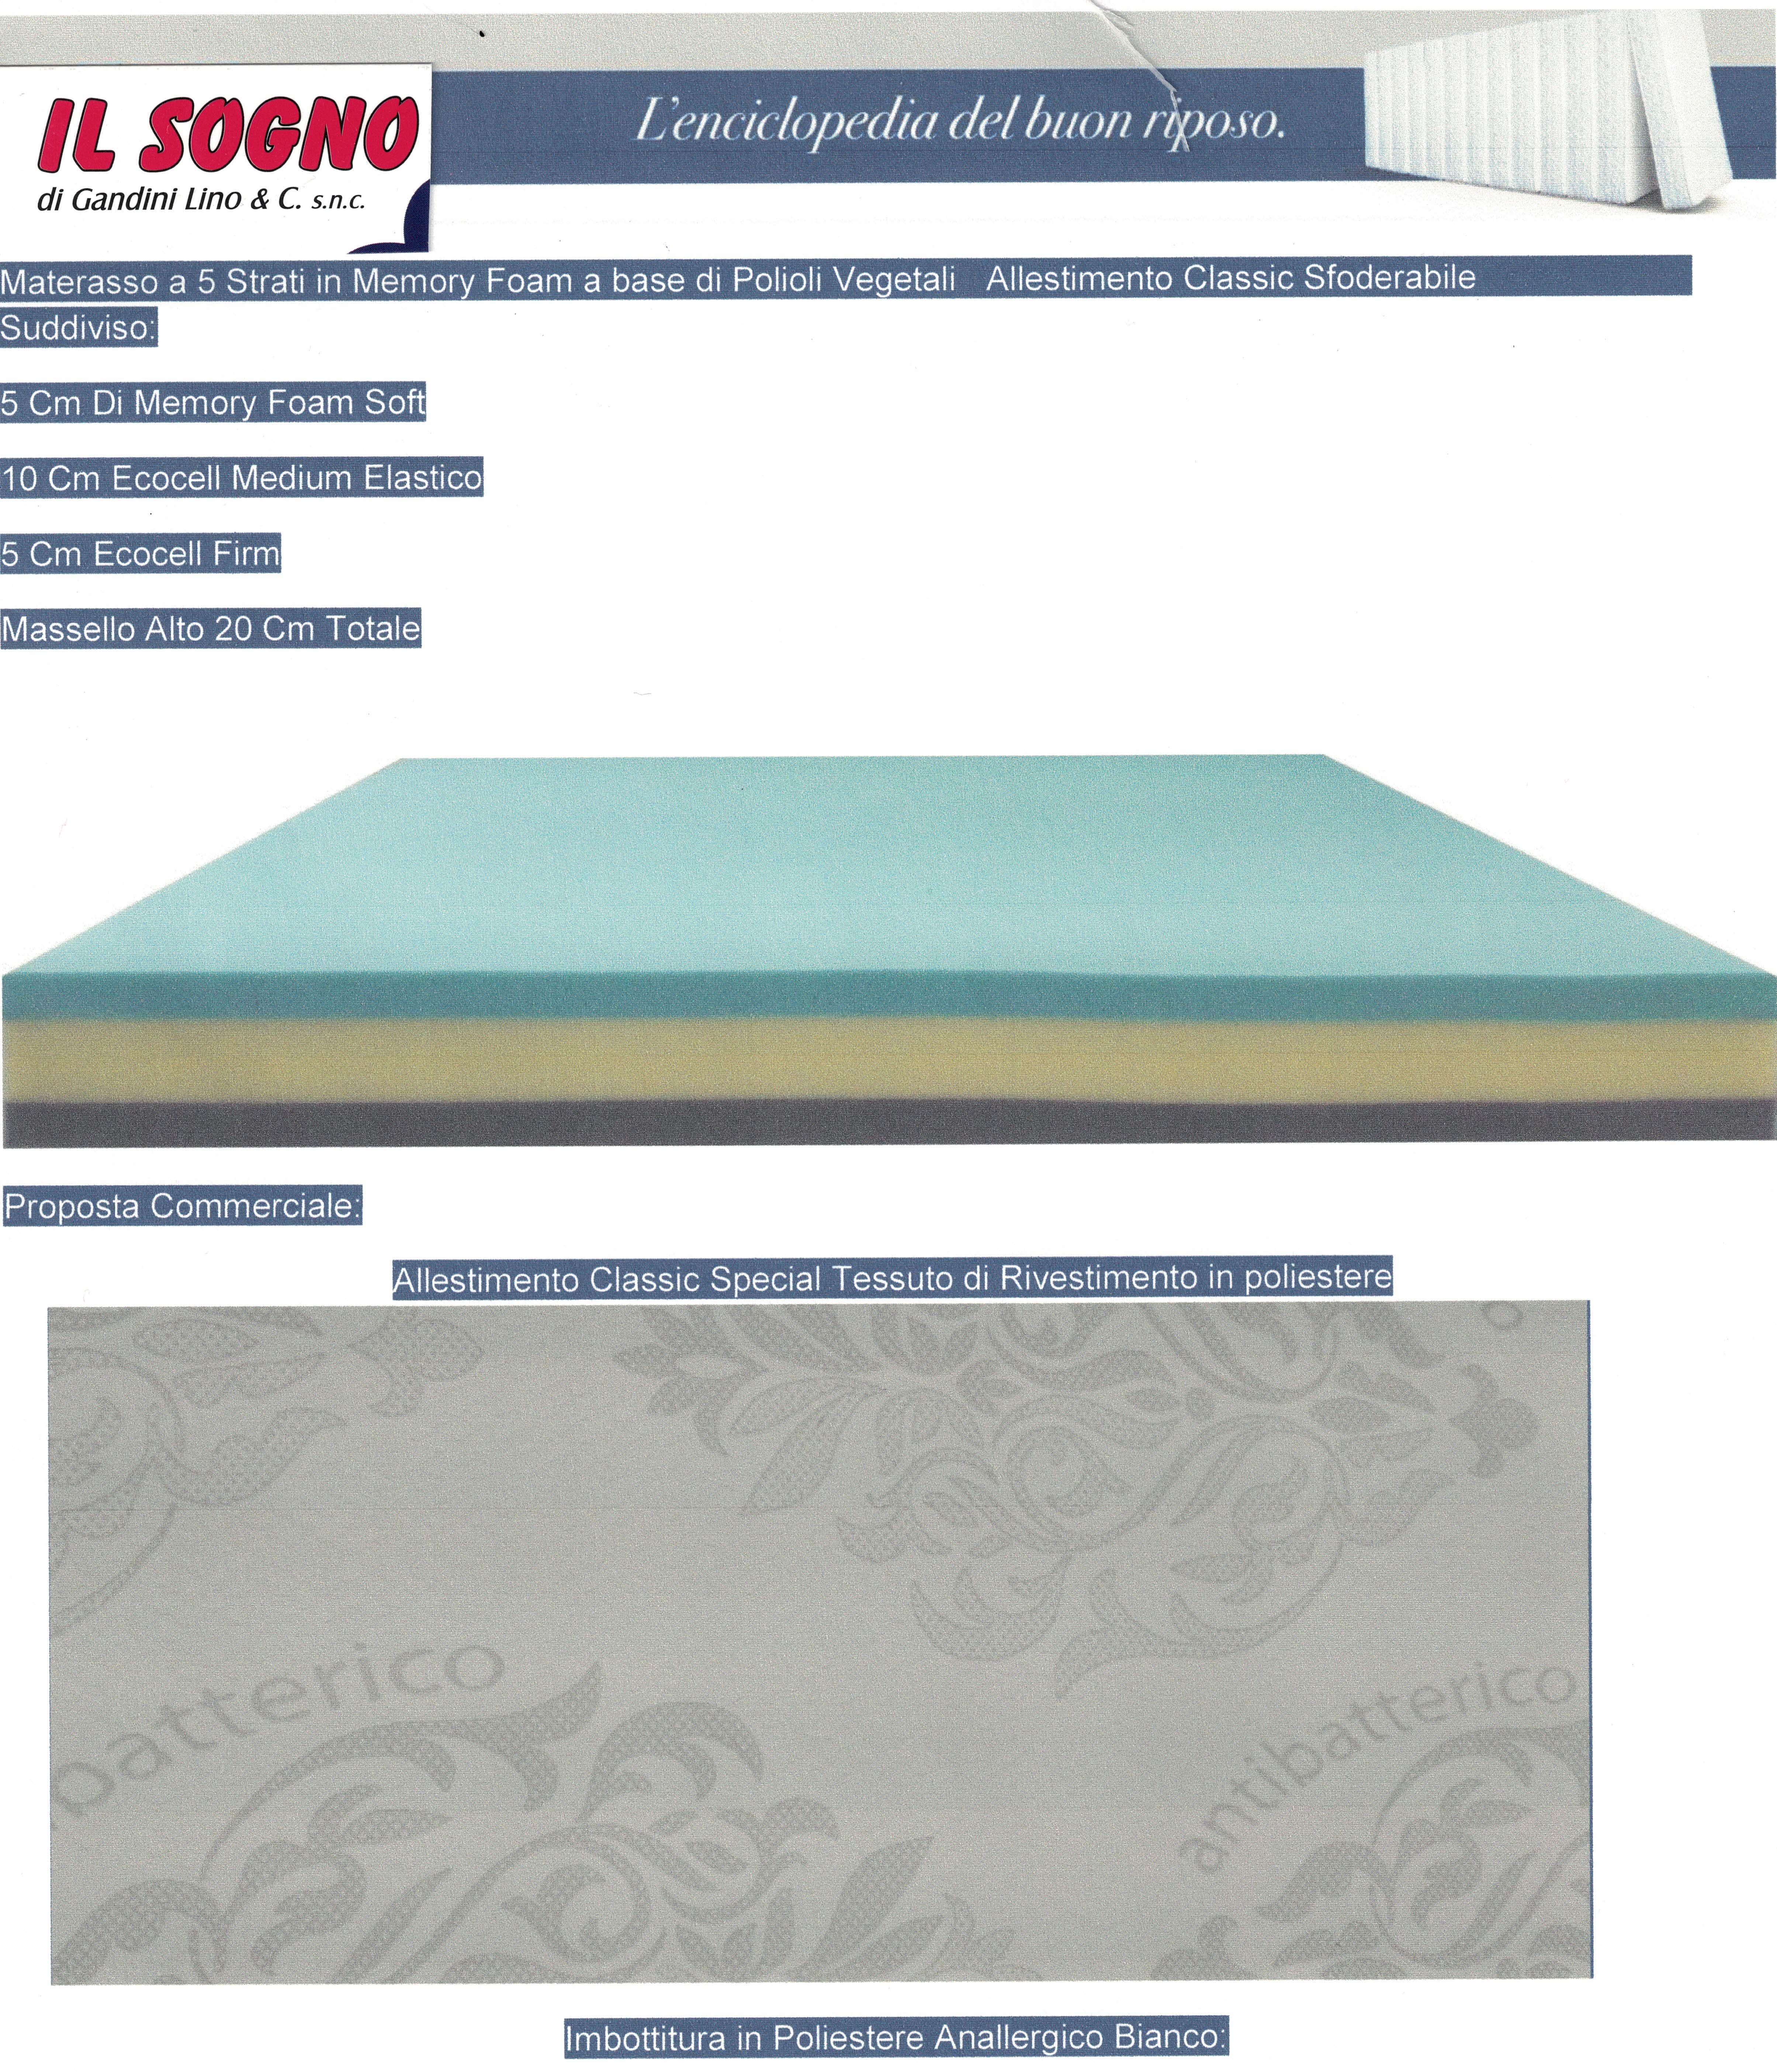 materasso da 20 cm Mobilier D/éco Lotto rete 90 x 190 cm singolo + 4 piedi